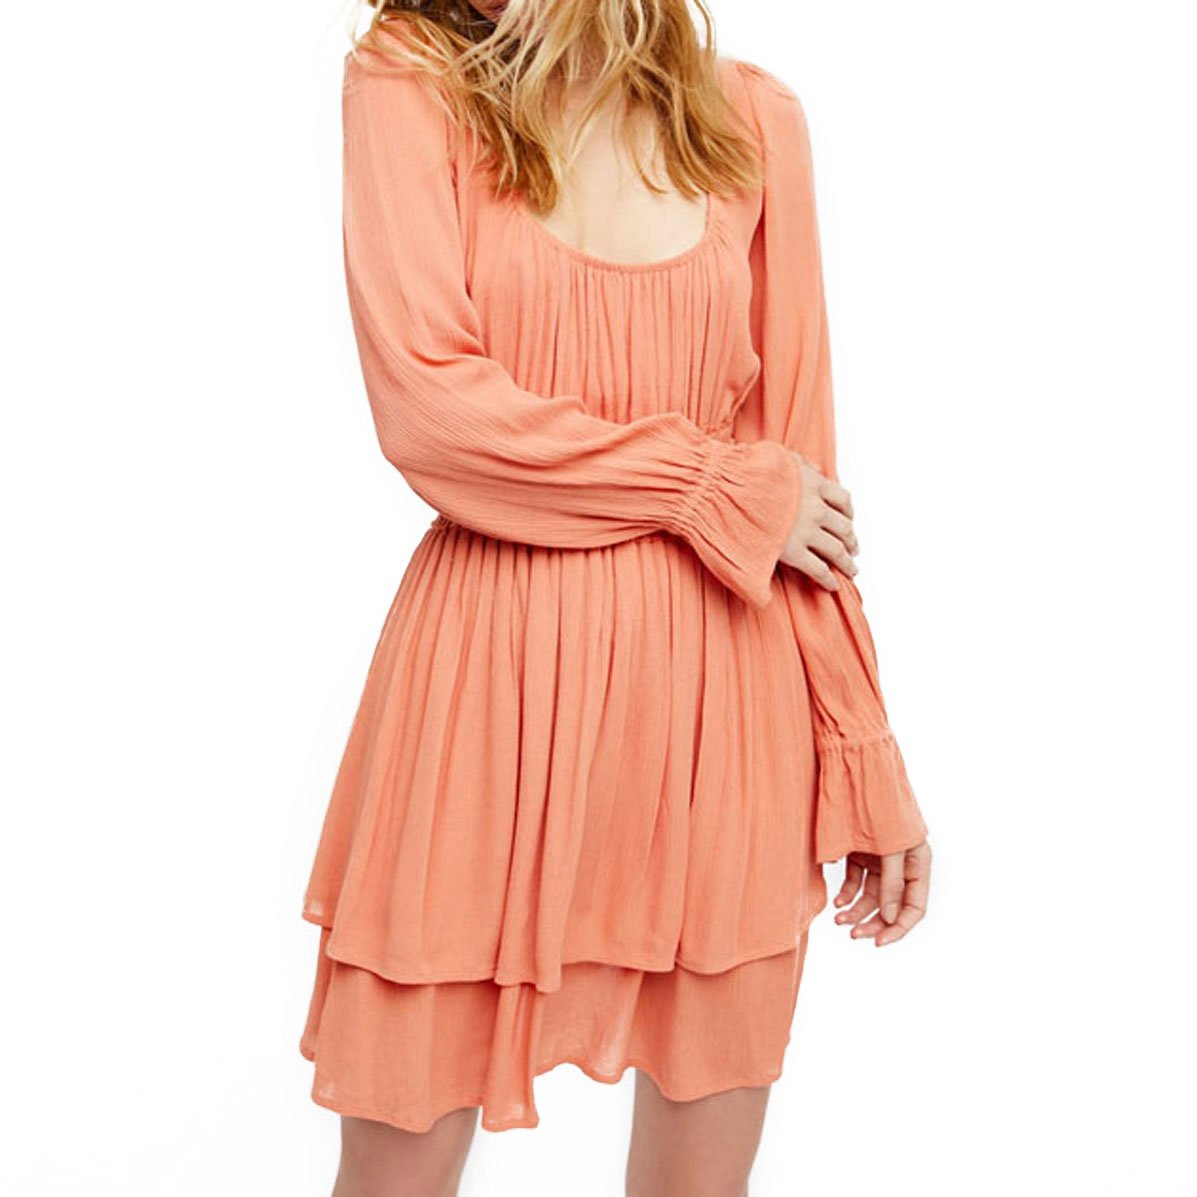 BellFlower Long Sleeve Bohemian Solid Backless Sexy Boho O Neck Mini Dress Female (L, Pink)